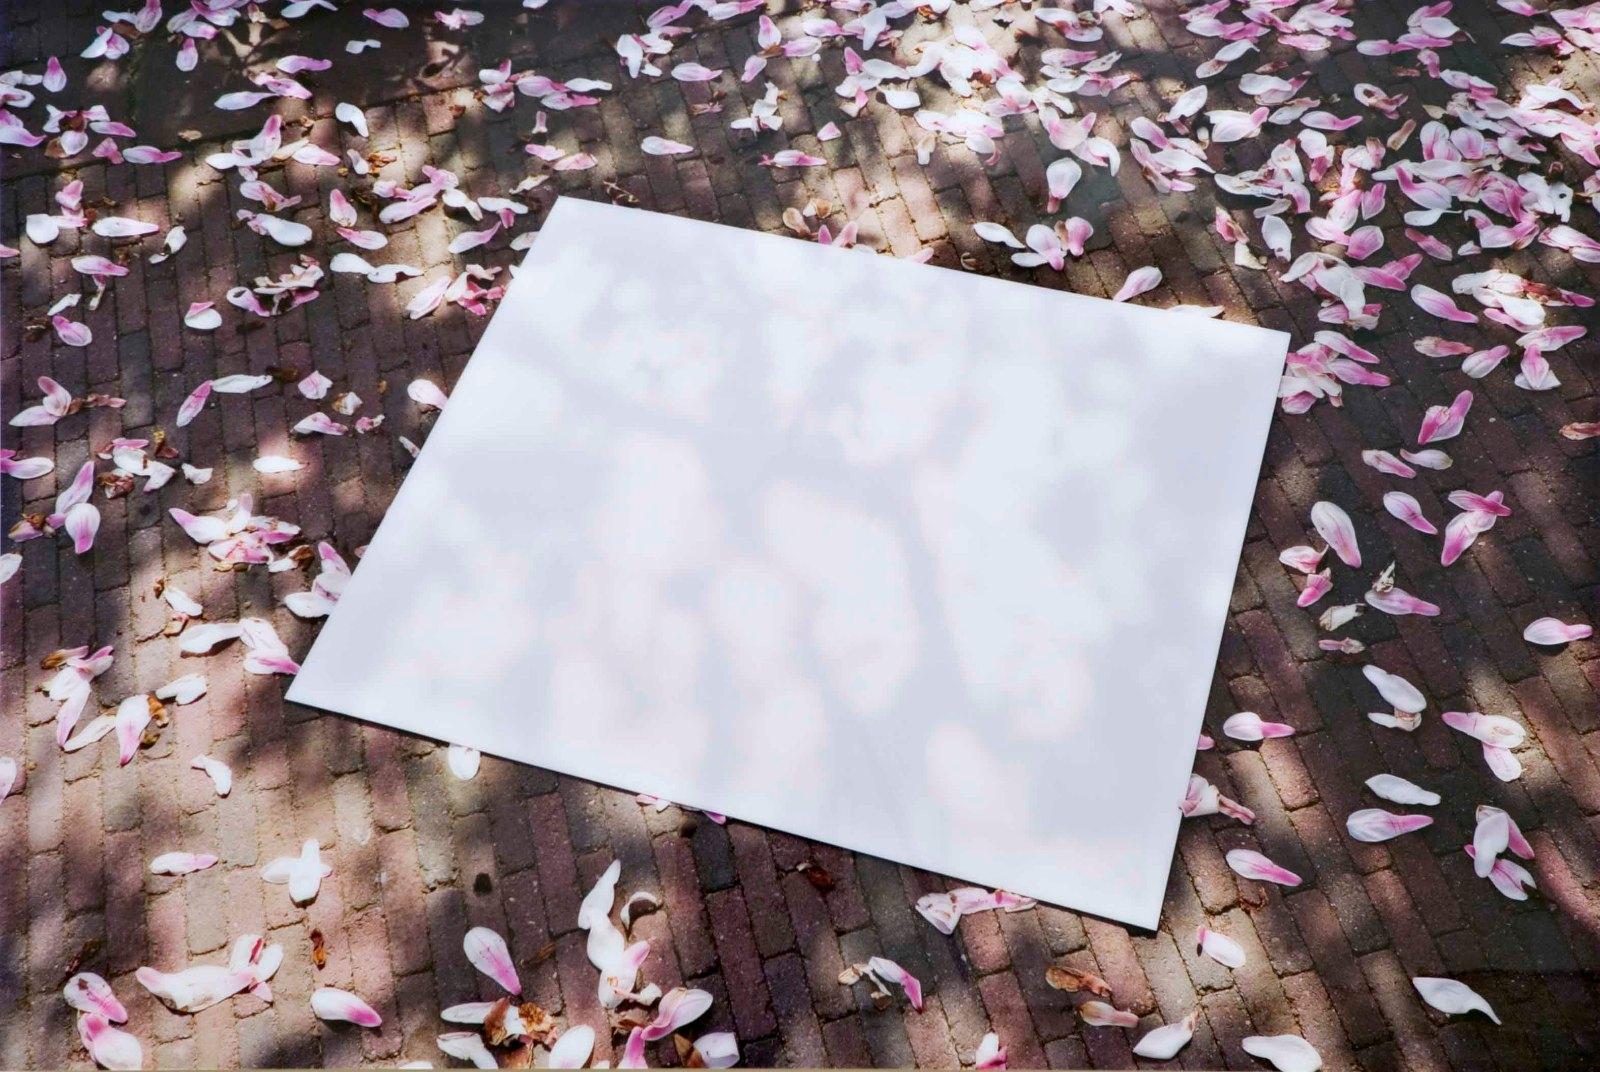 Coming up soon, 2002, C-print on di-bond, perspex, 120 x 178 cm